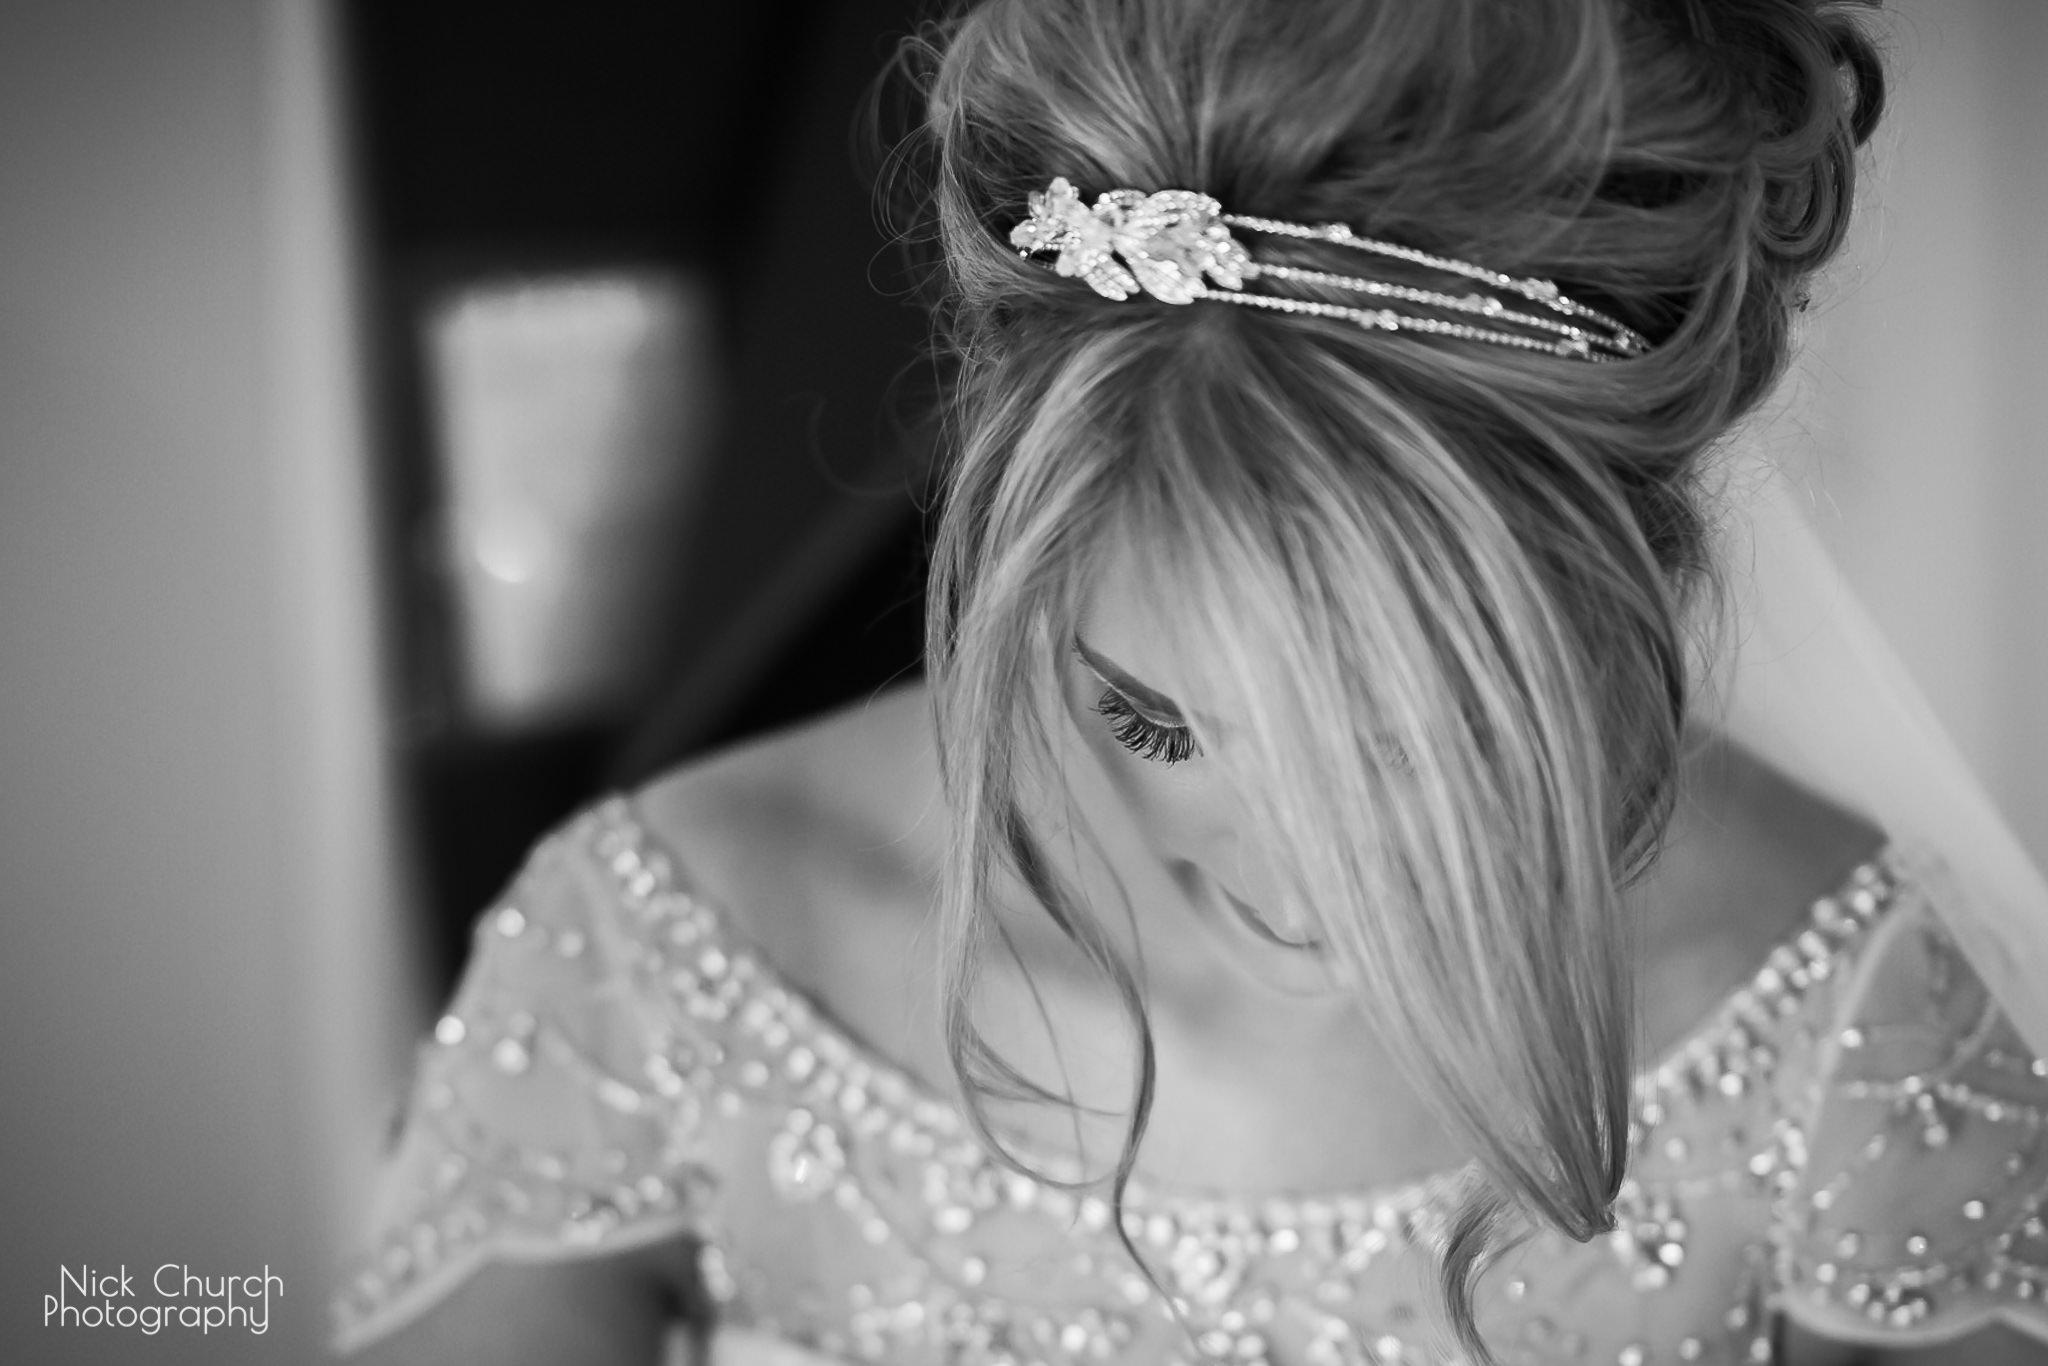 NC-20180317-stacy-and-mike-wedding-0279.jpg